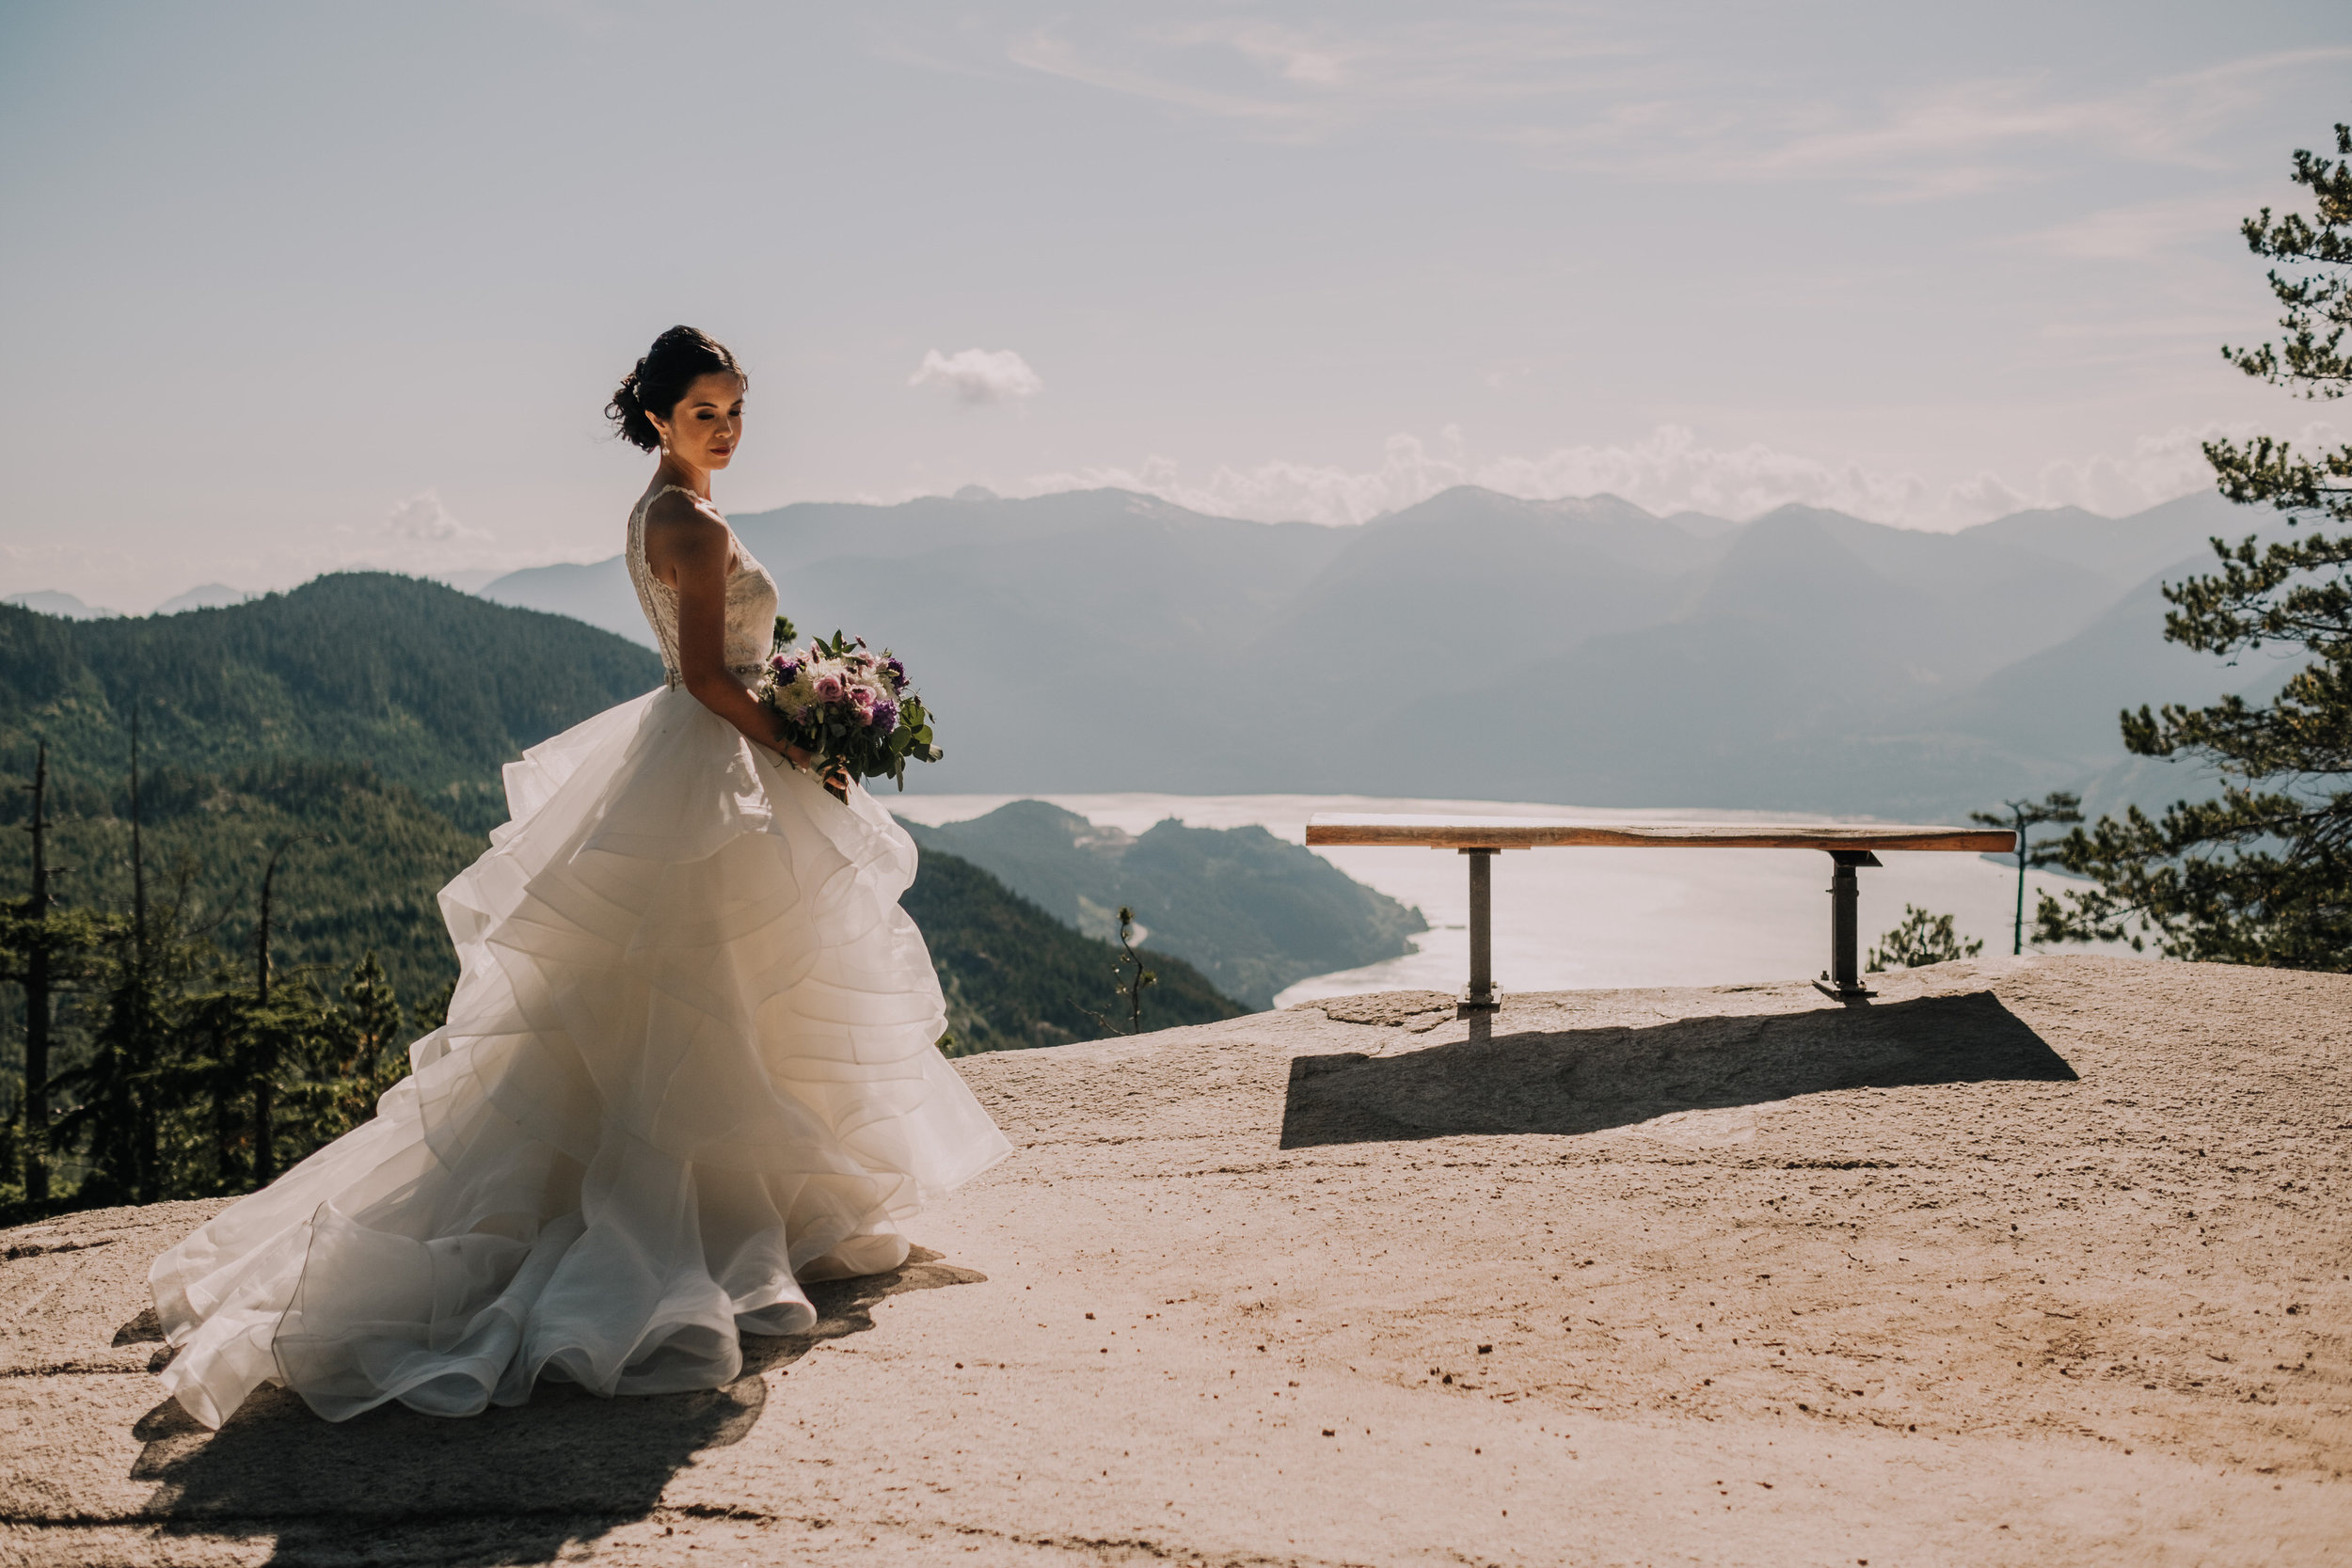 Squamish Wedding Photographer - Sea to Sky Gondola Wedding Photos -  Vancouver Wedding Photographer & Videographer - Sunshine Coast Wedding Photos - Sunshine Coast Wedding Photographer - Jennifer Picard Photography - DSCF7649.jpg